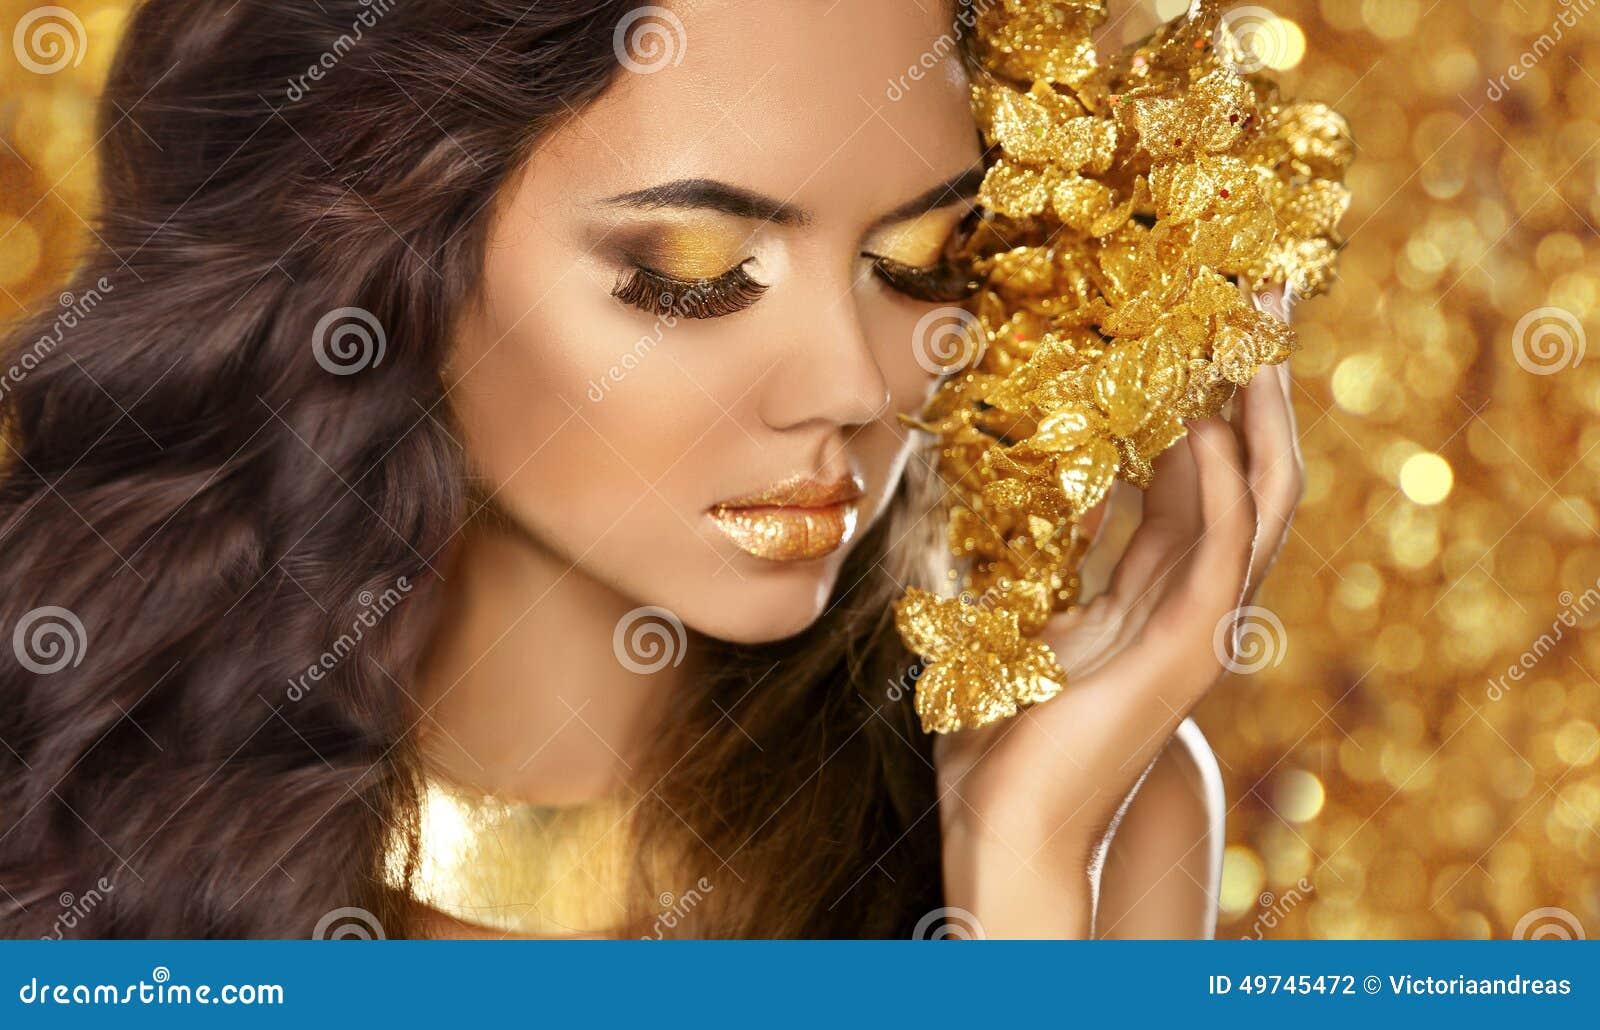 Fashion Beauty Girl Portrait Eyes Makeup Golden Jewelry